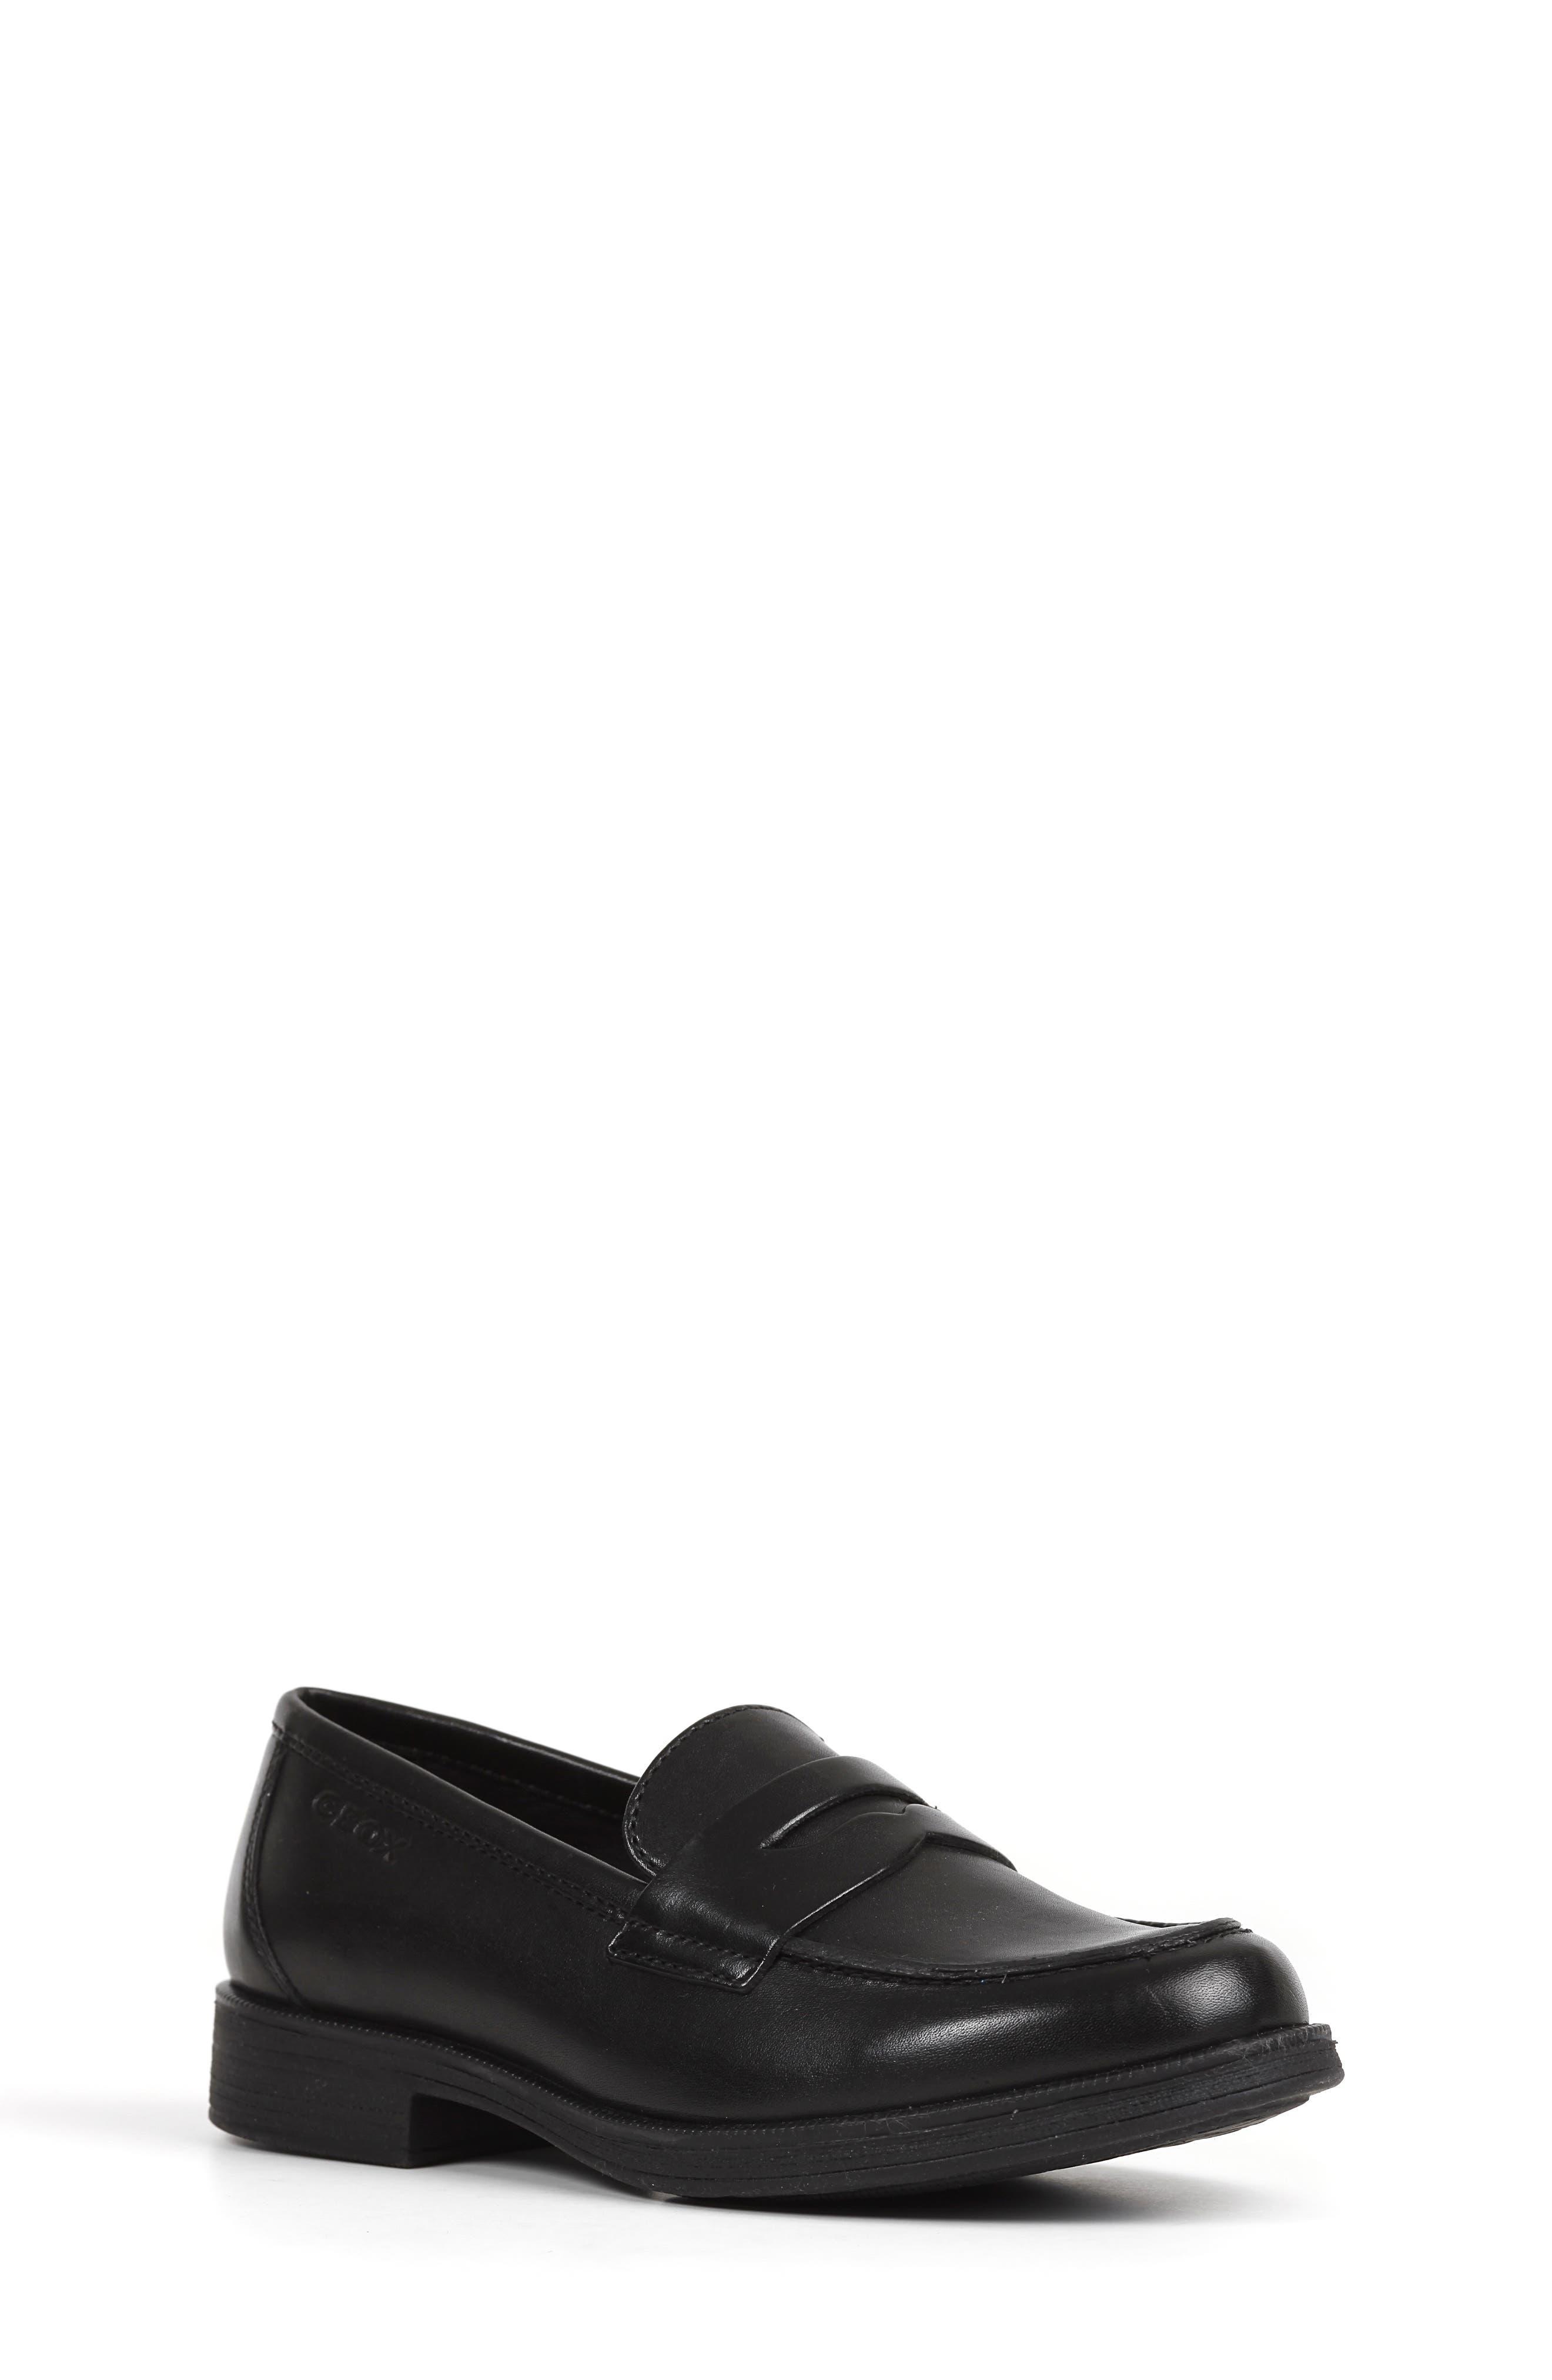 Boys Geox Agata 1 Penny Loafer Size 4US  36EU  Black